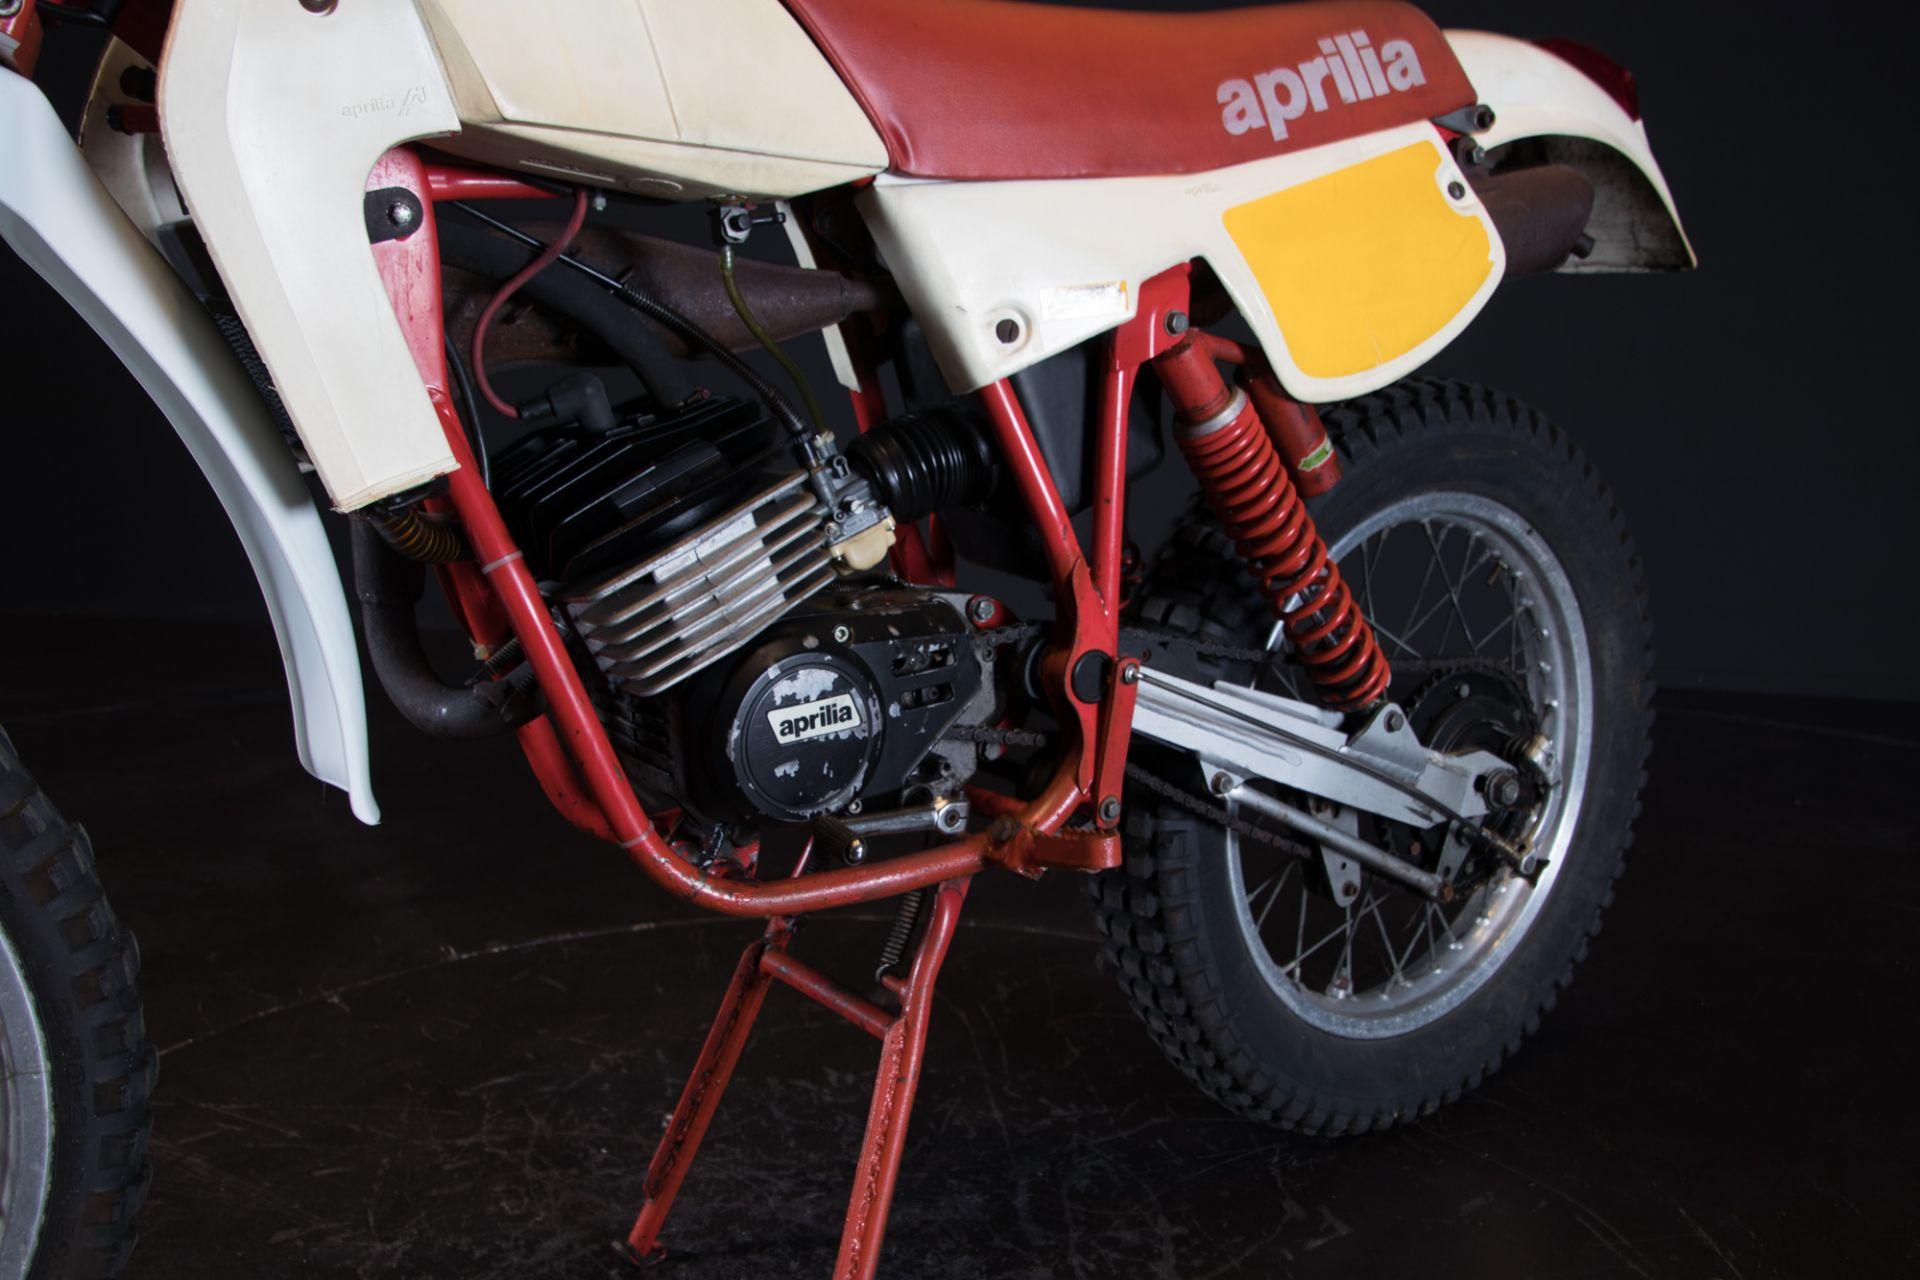 1977 Aprilia Scarabeo RC 7114